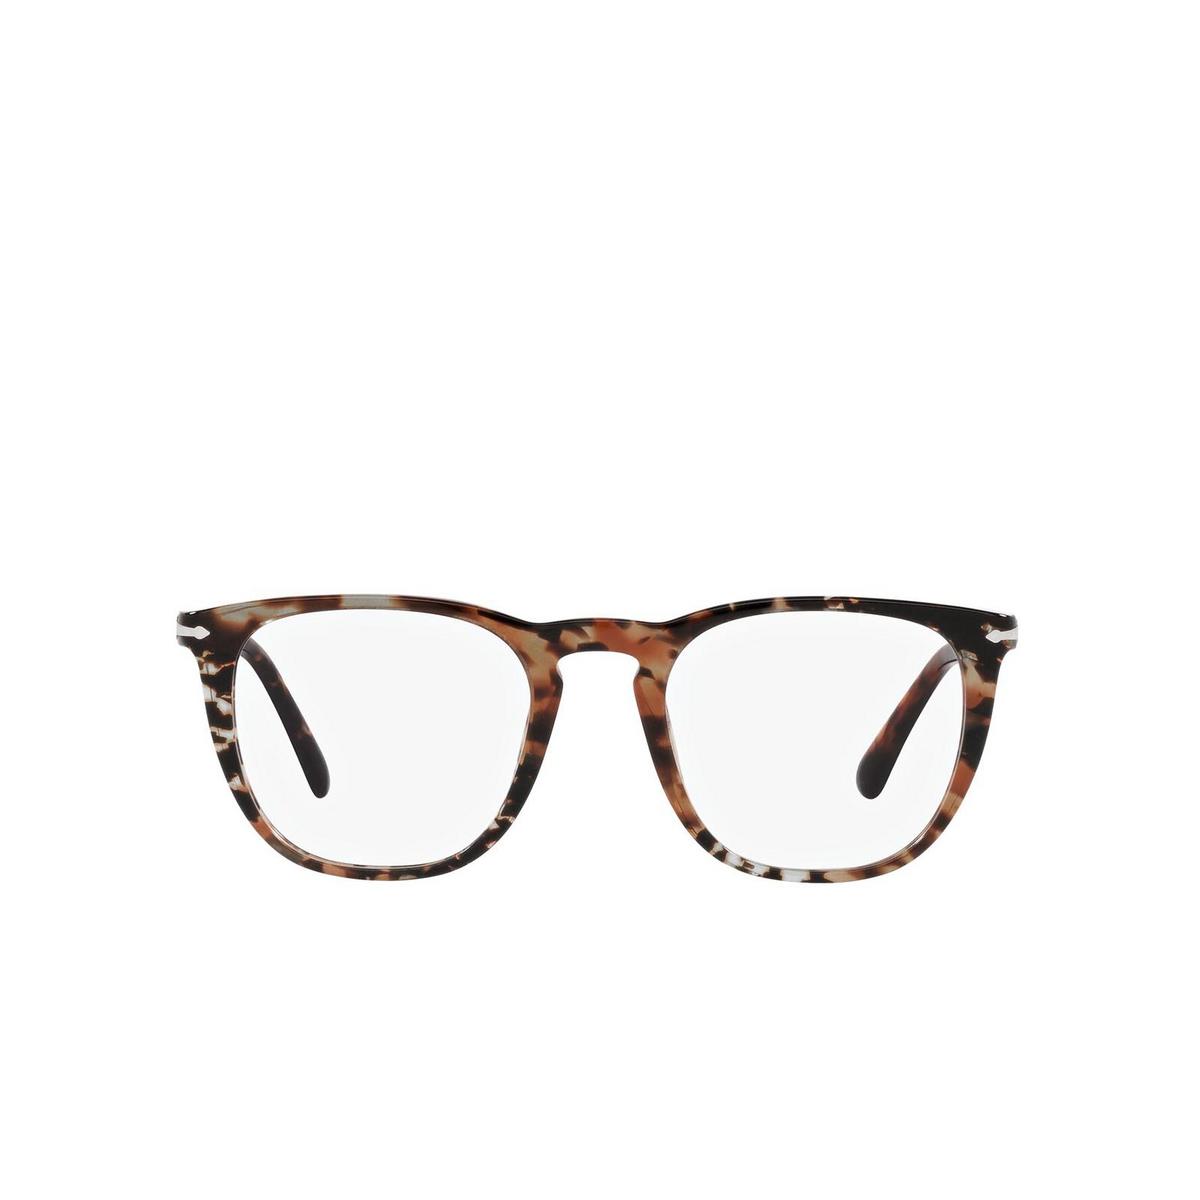 Persol® Square Eyeglasses: PO3266V color Havana 1081 - front view.